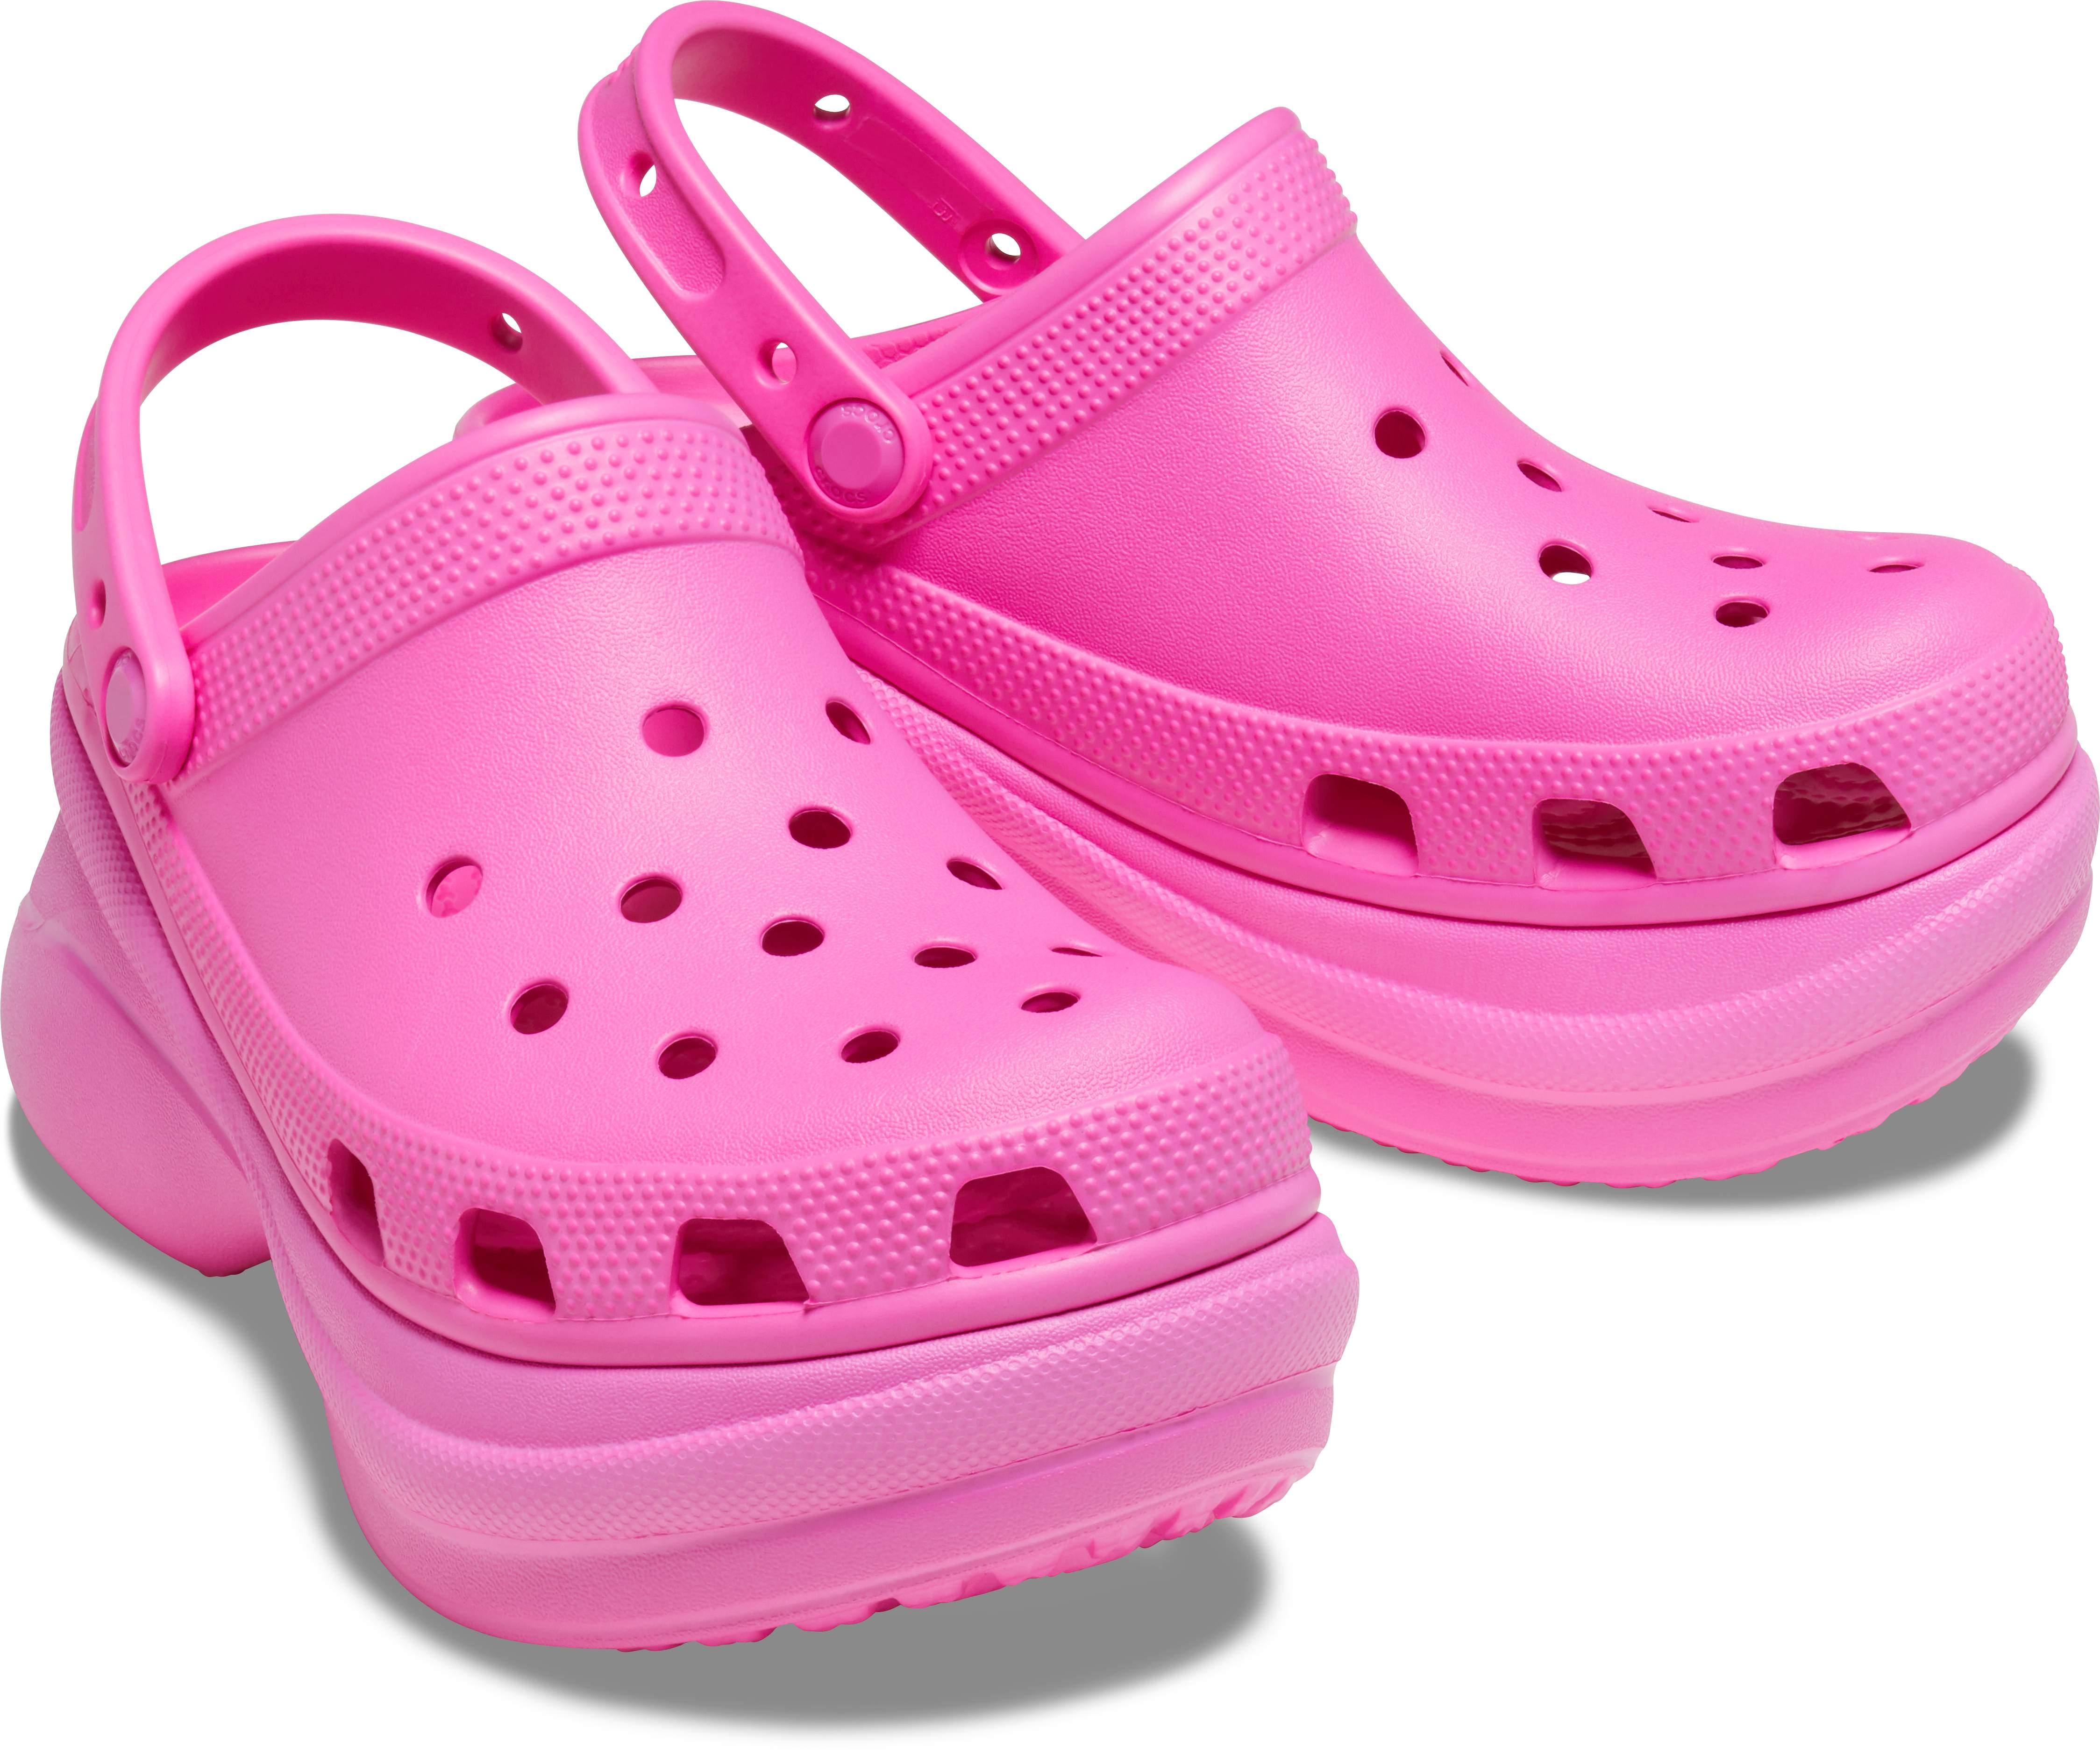 Tongs de Loisirs et v/êtements de Sport pour Femmes Crocs Classic Bae Clog W